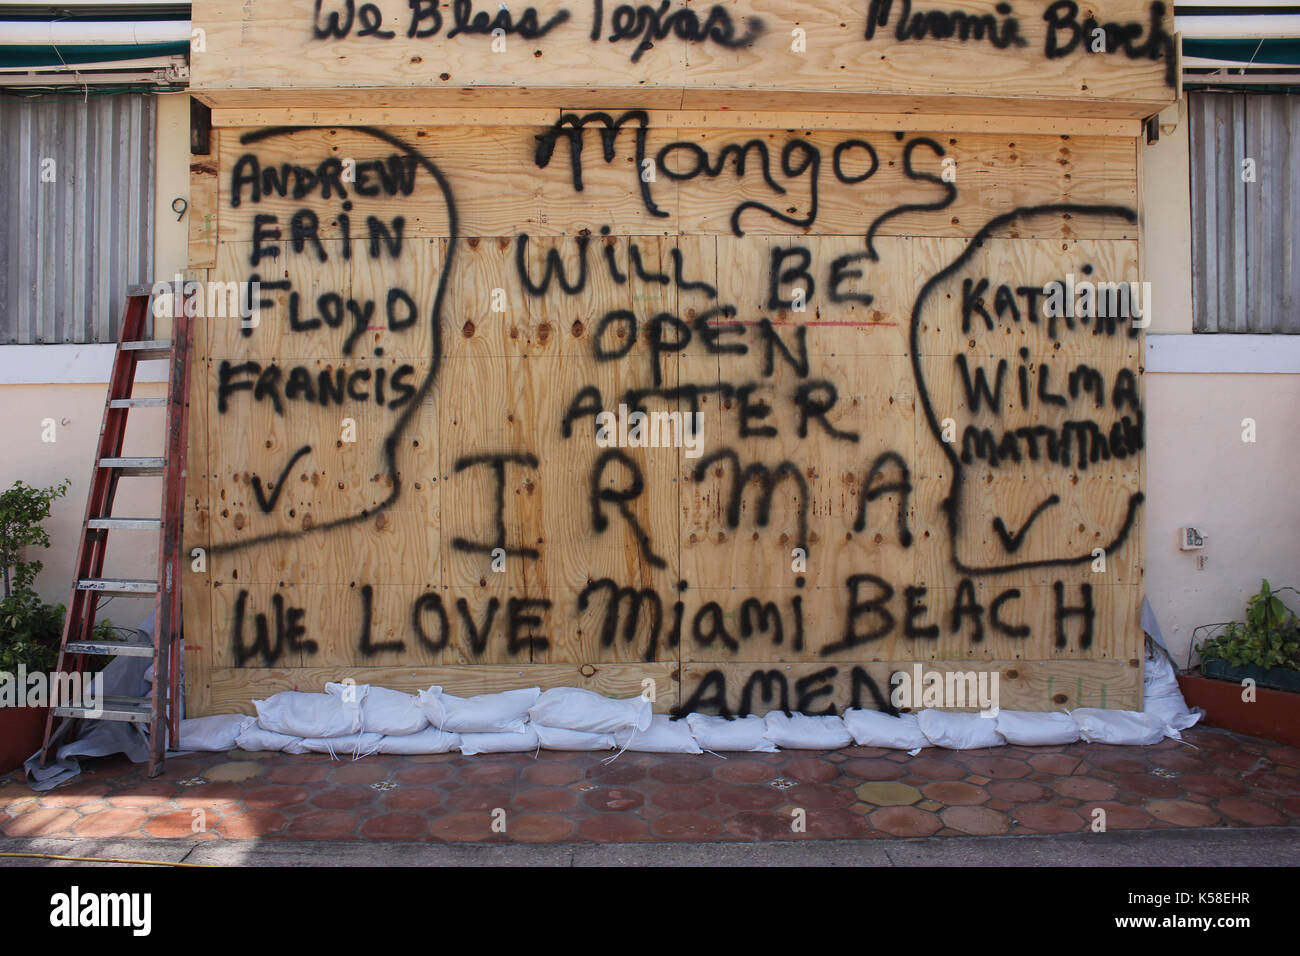 Miami beach, déserte, irma, avant l'ouragan, le 8 septembre 2017 Photo Stock